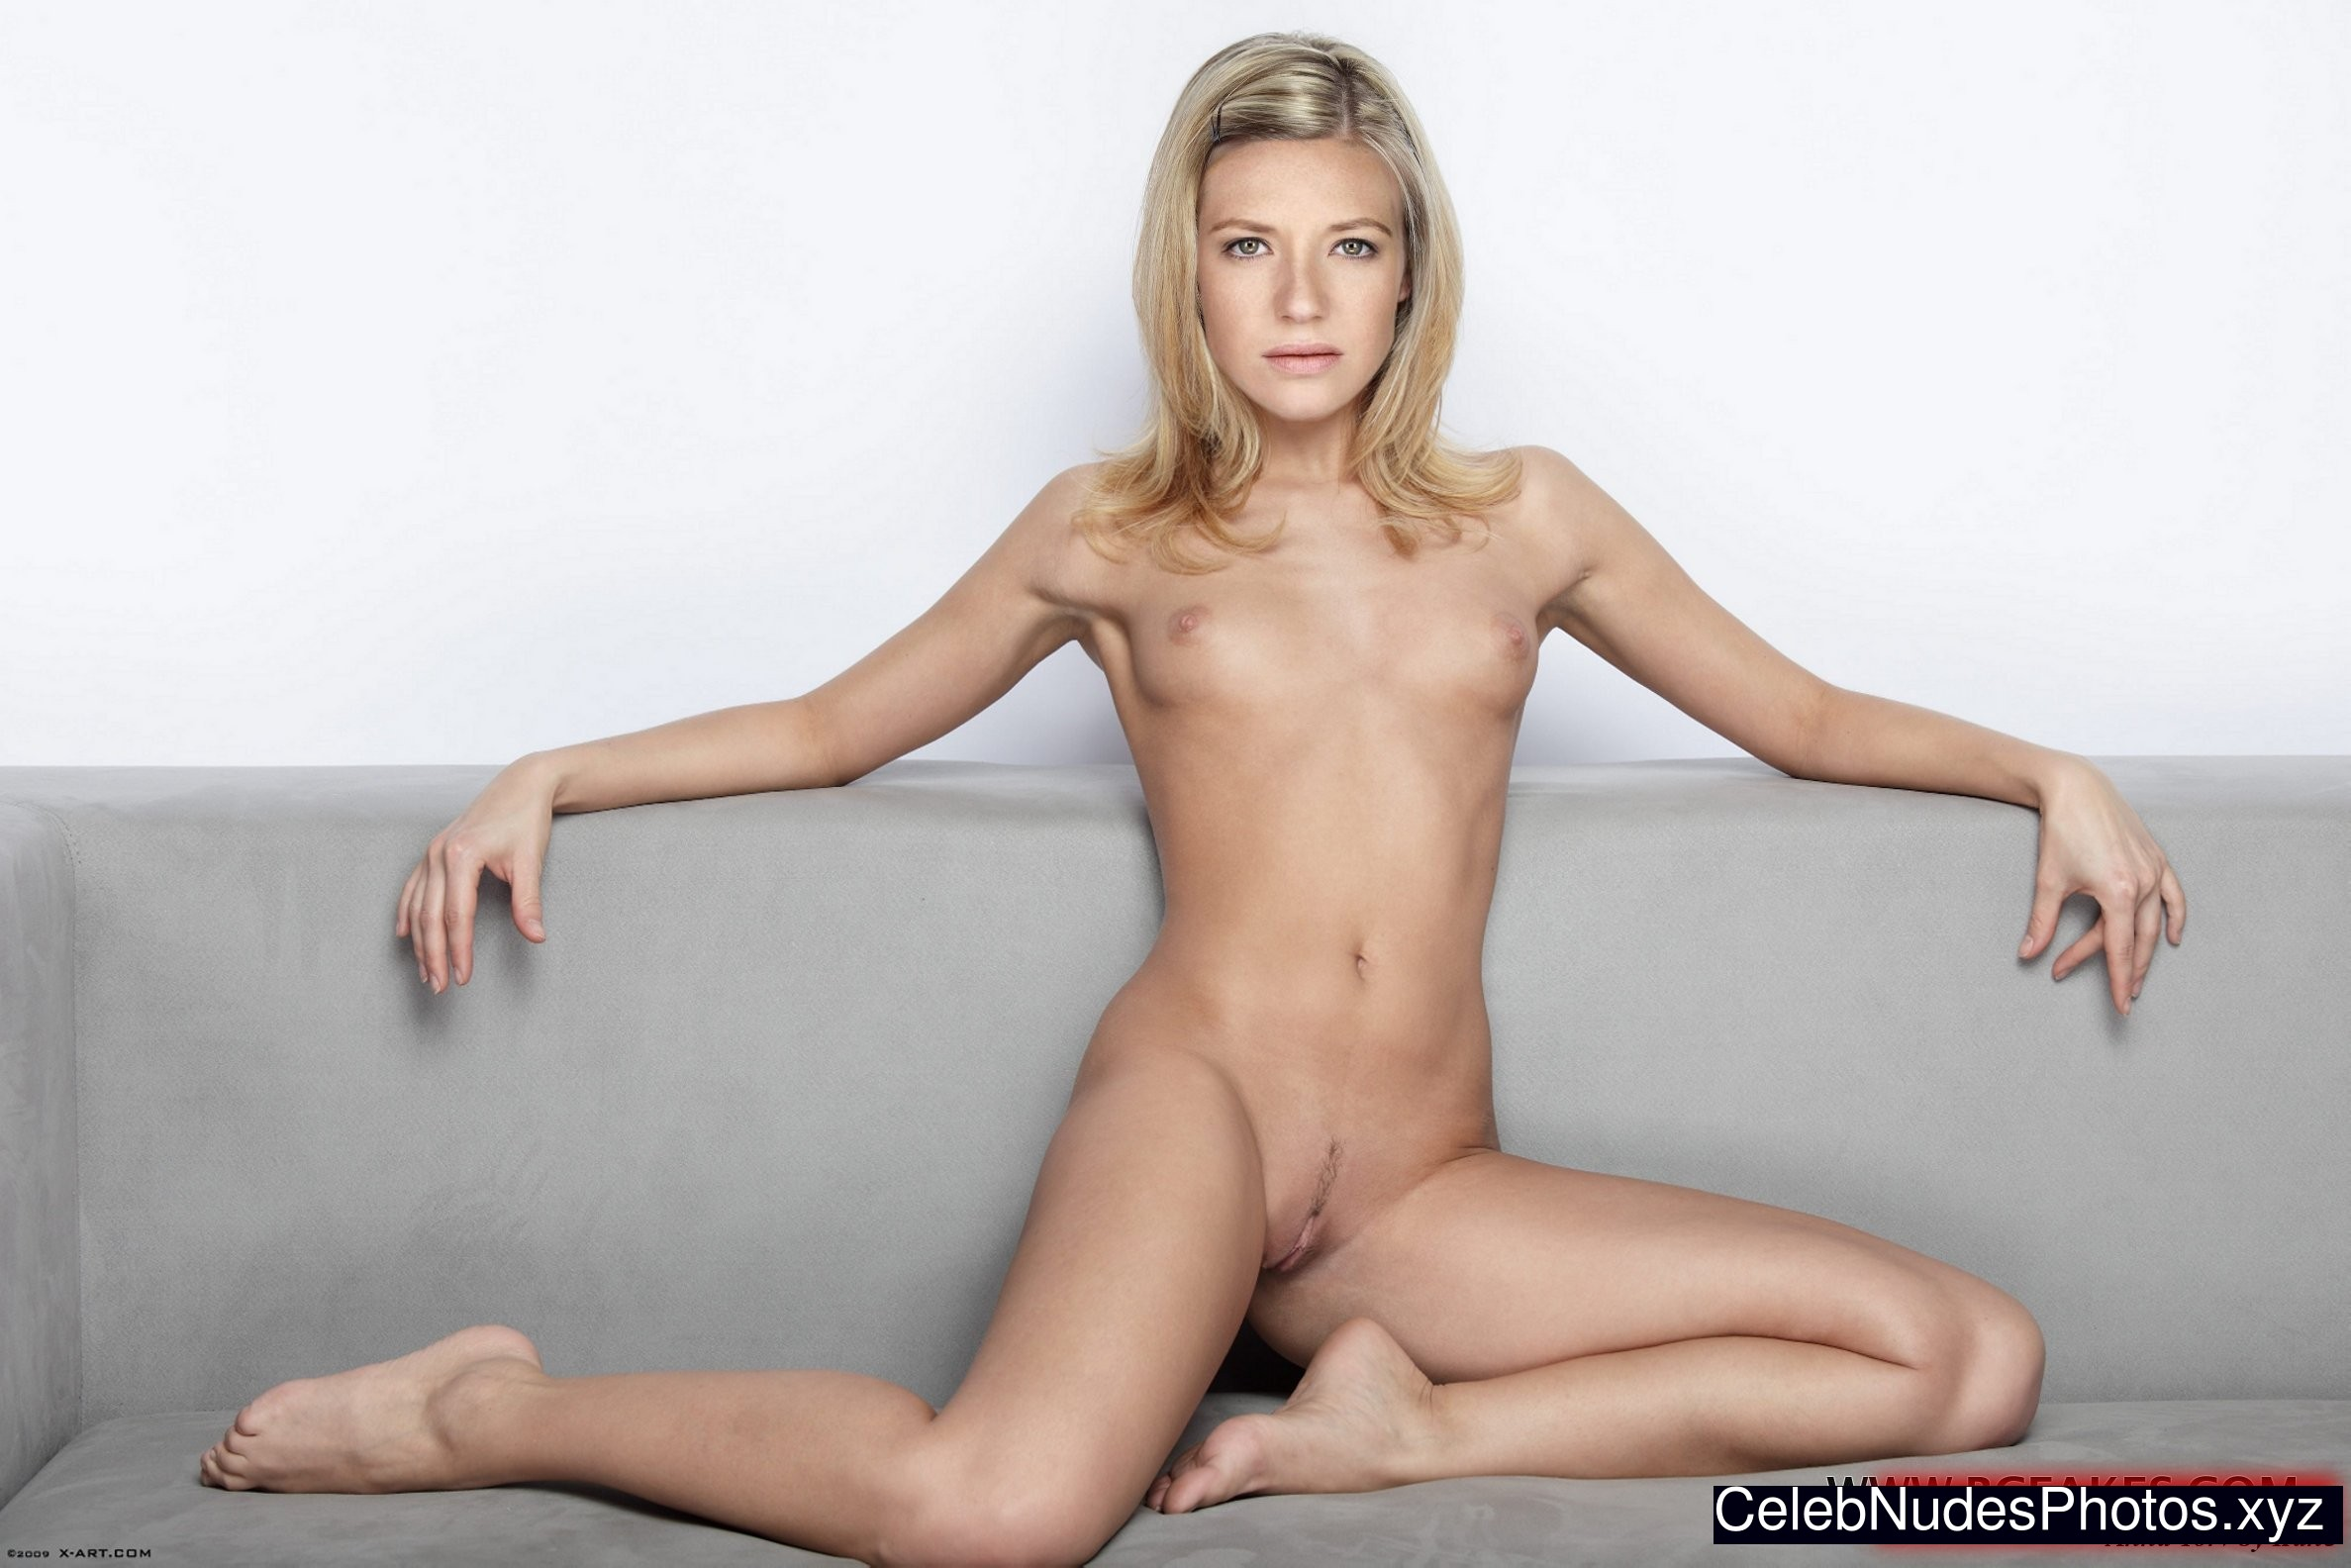 Porn anna torv Anna Torv